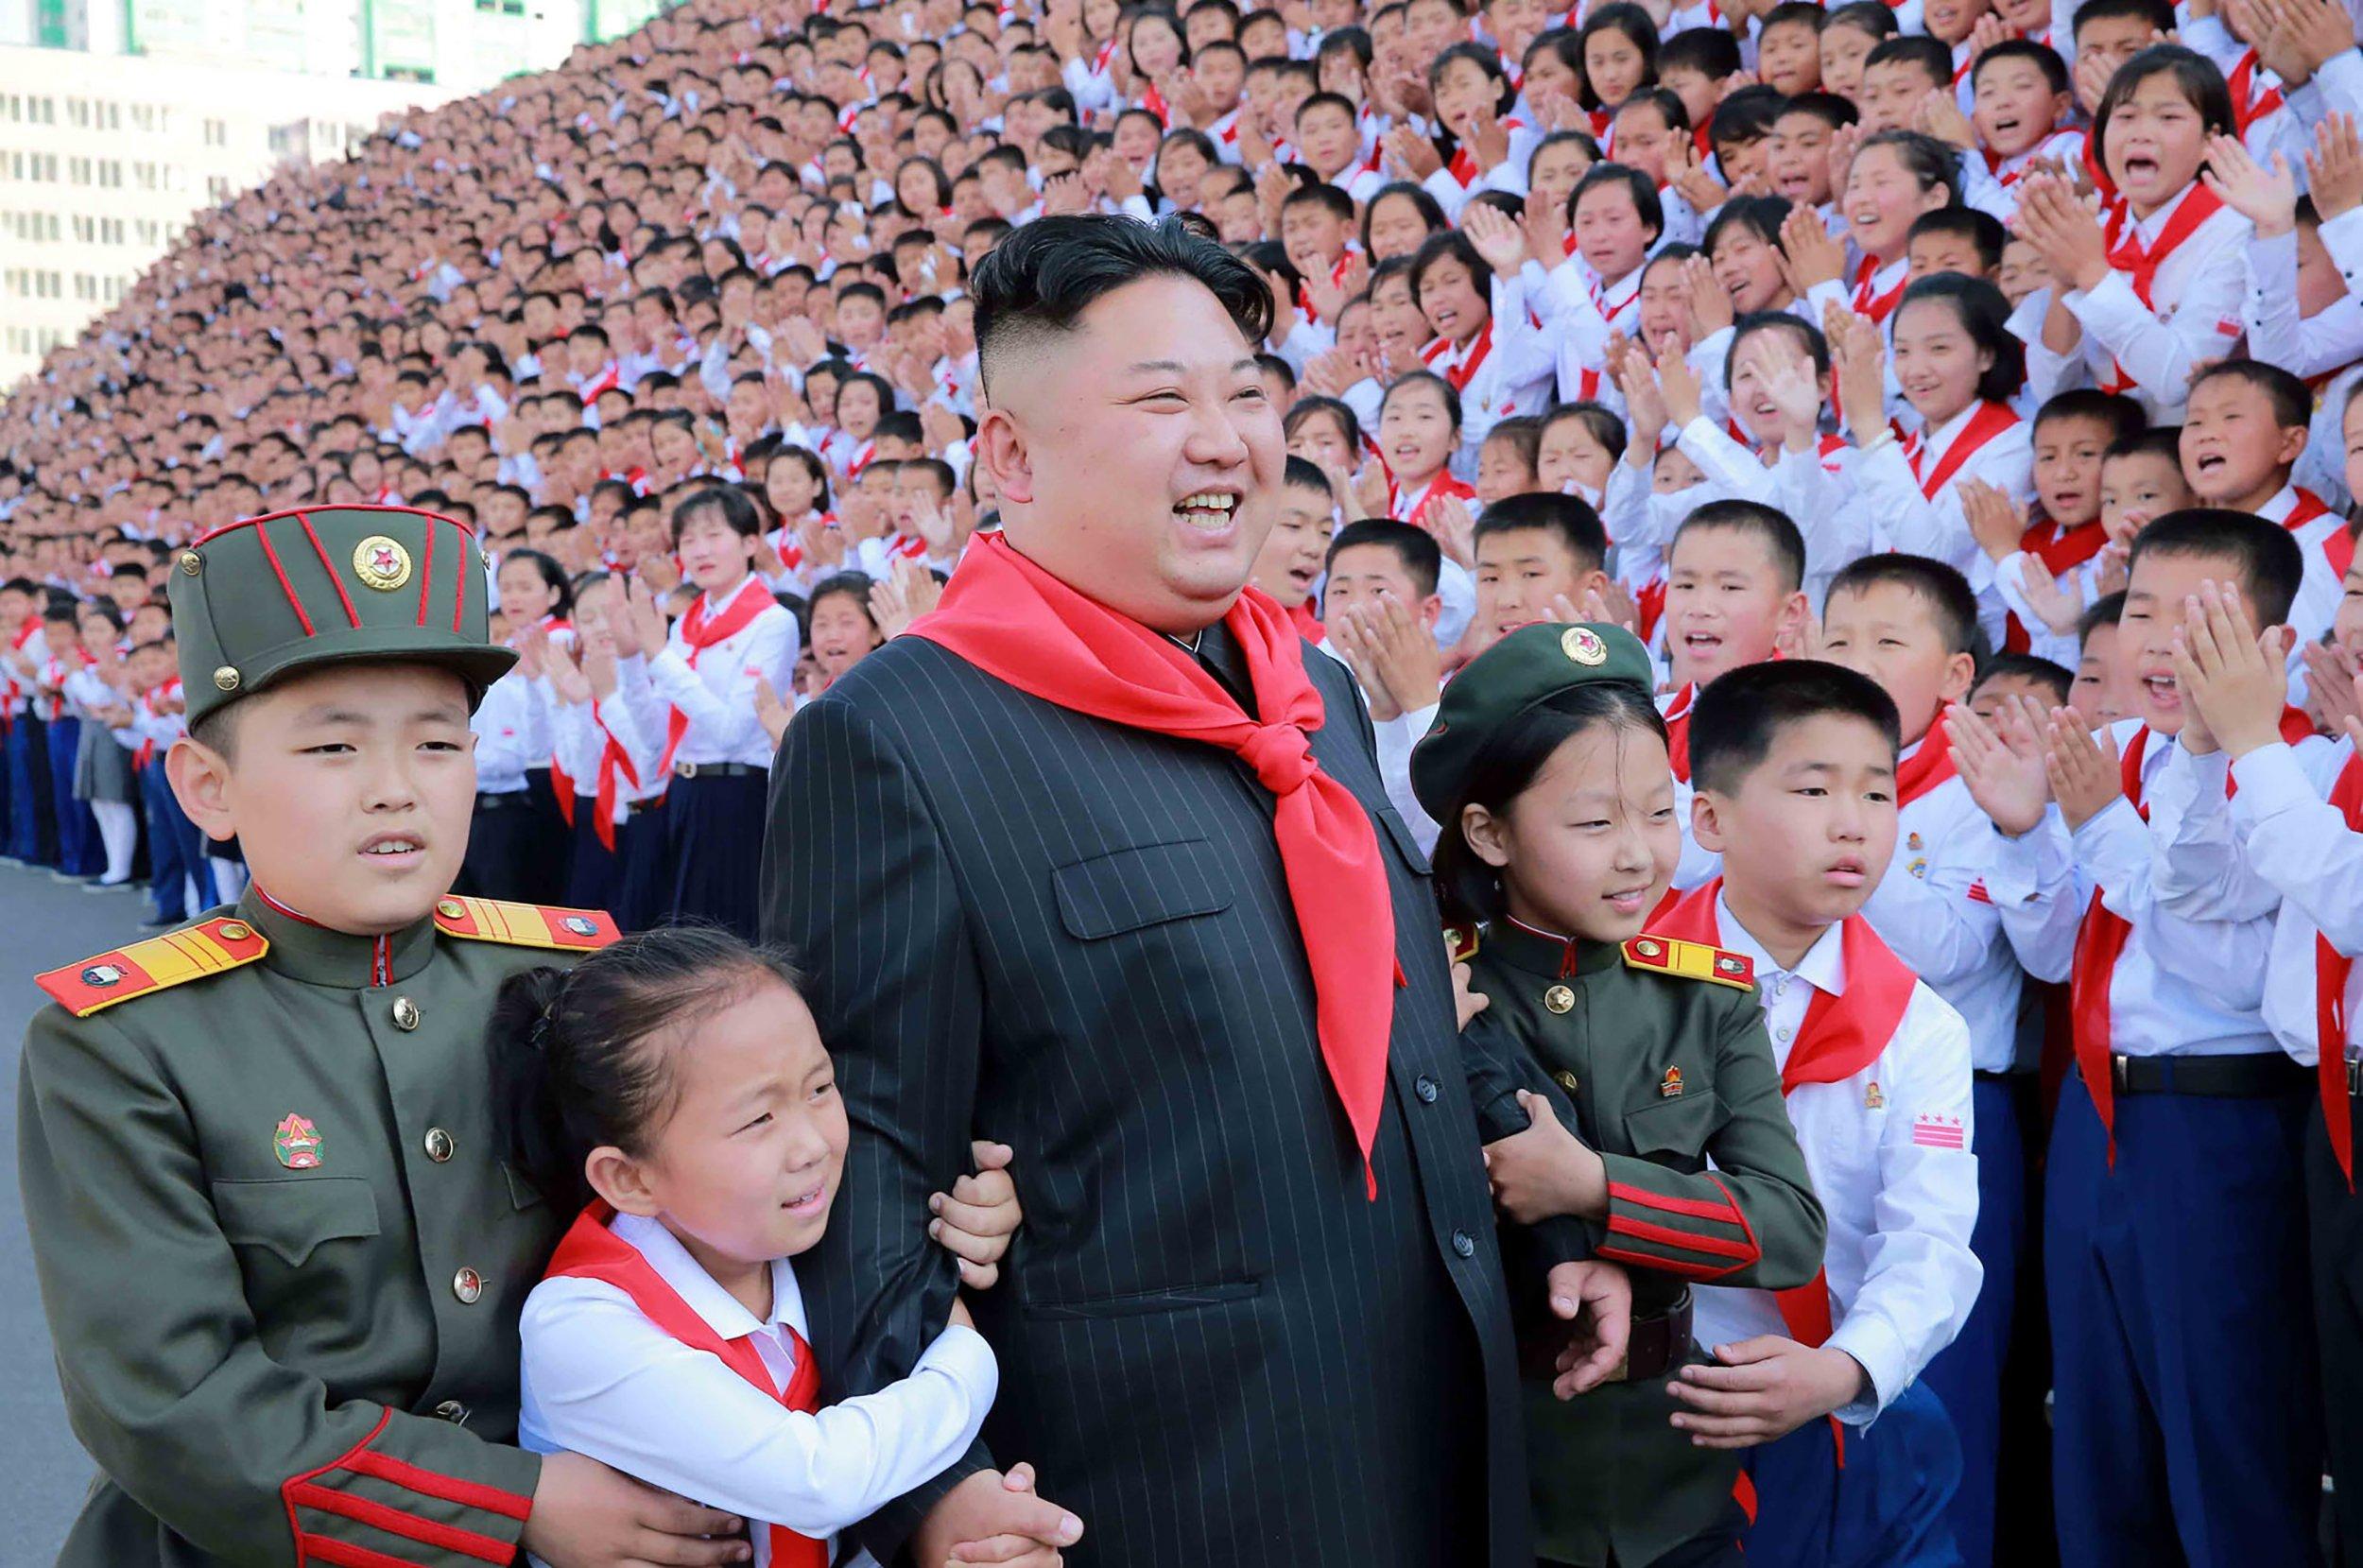 Korean Children's Union (KCU)